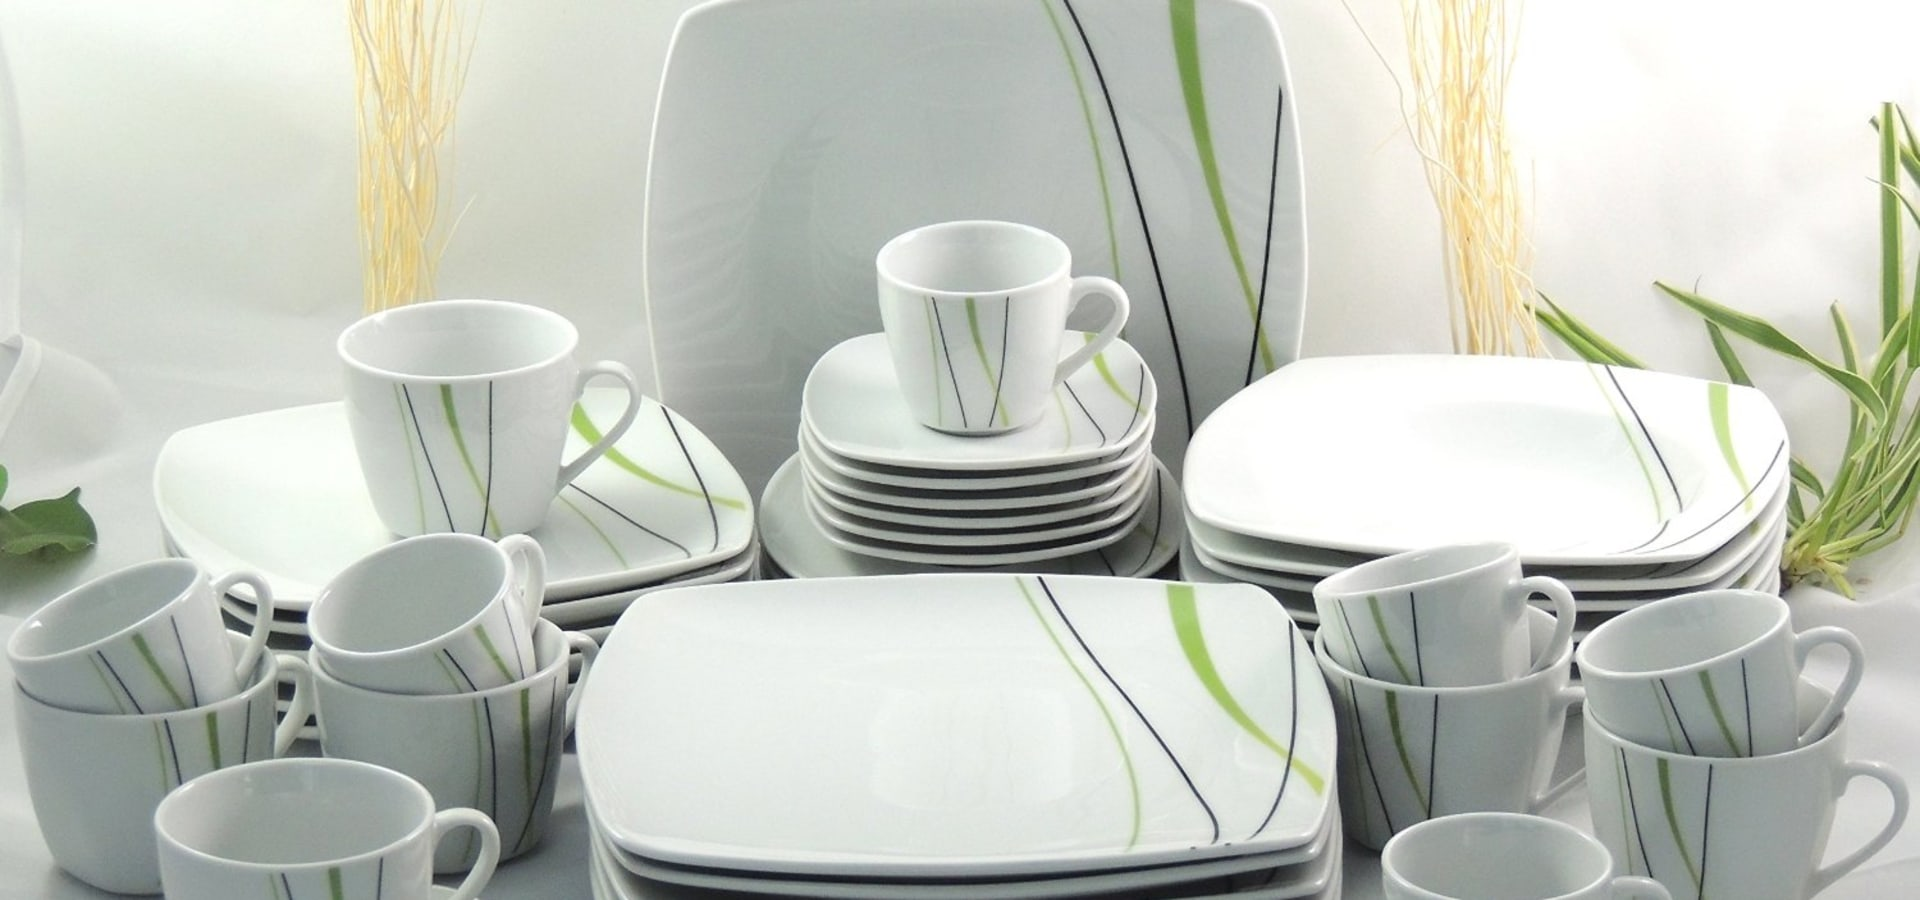 porzellan tafelservice essservice kombiservice 30tlg tk 972 malia ann di ciel porzellan glas e. Black Bedroom Furniture Sets. Home Design Ideas